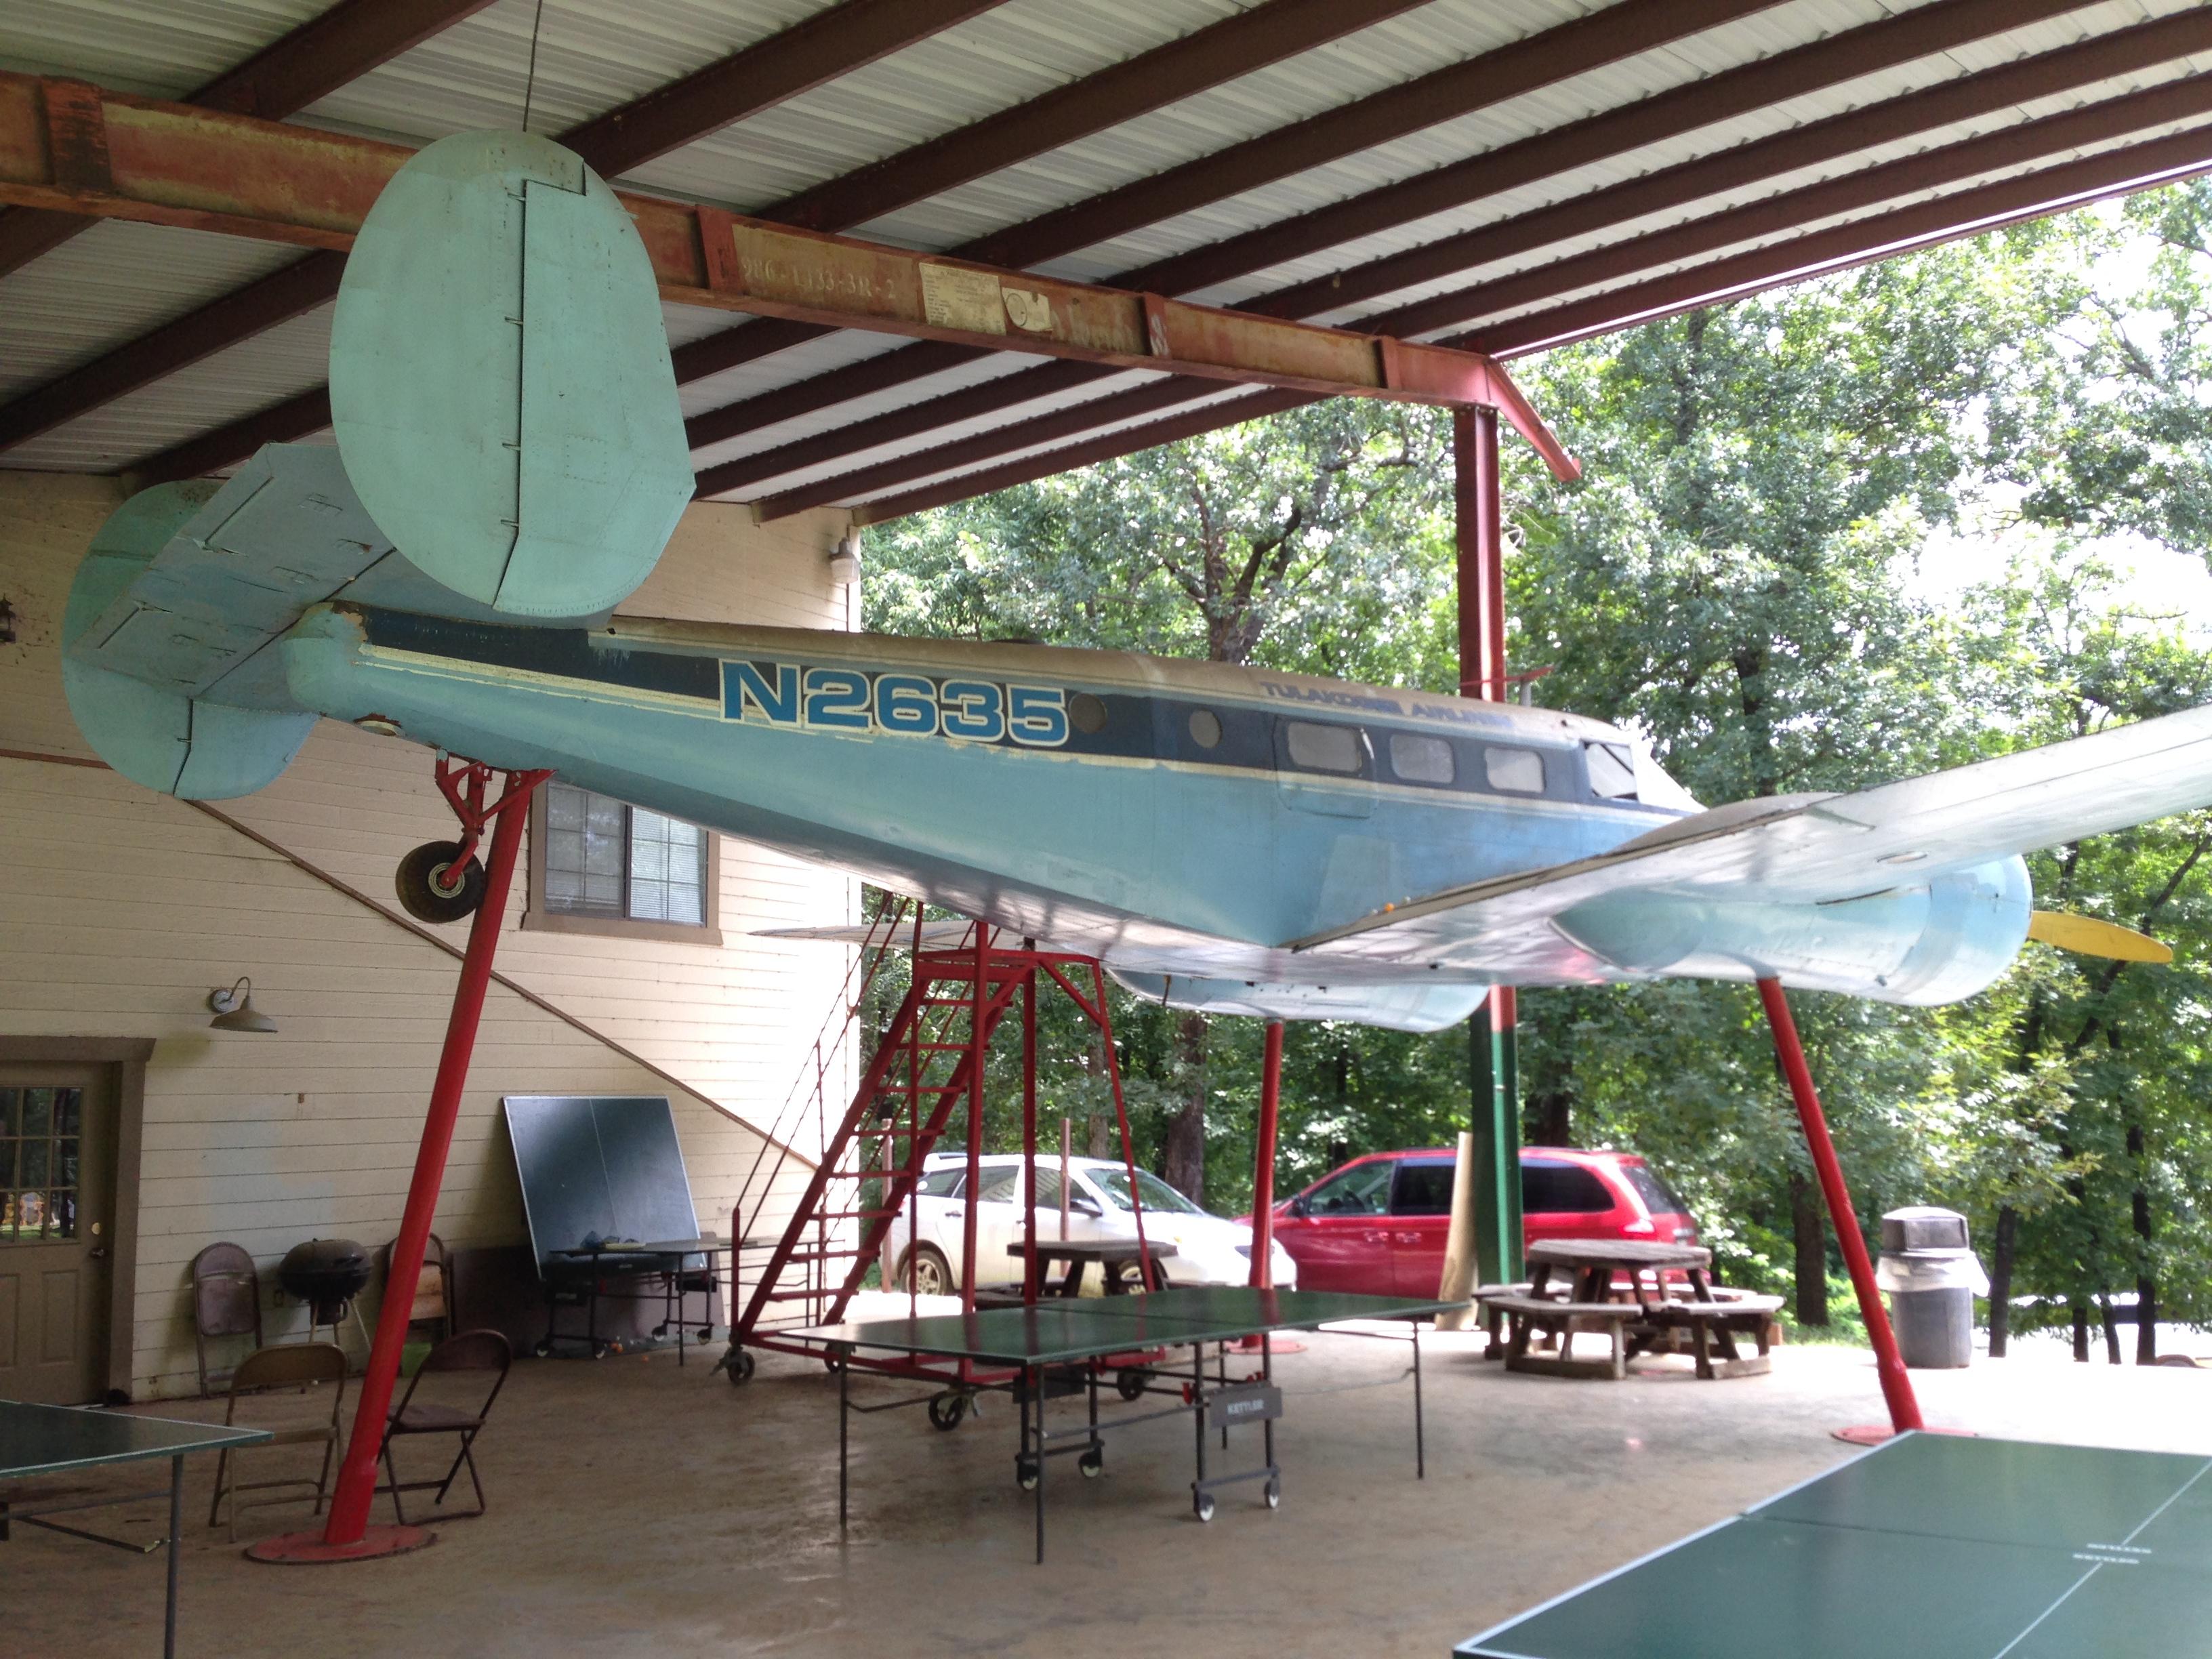 The twin engine passenger plane